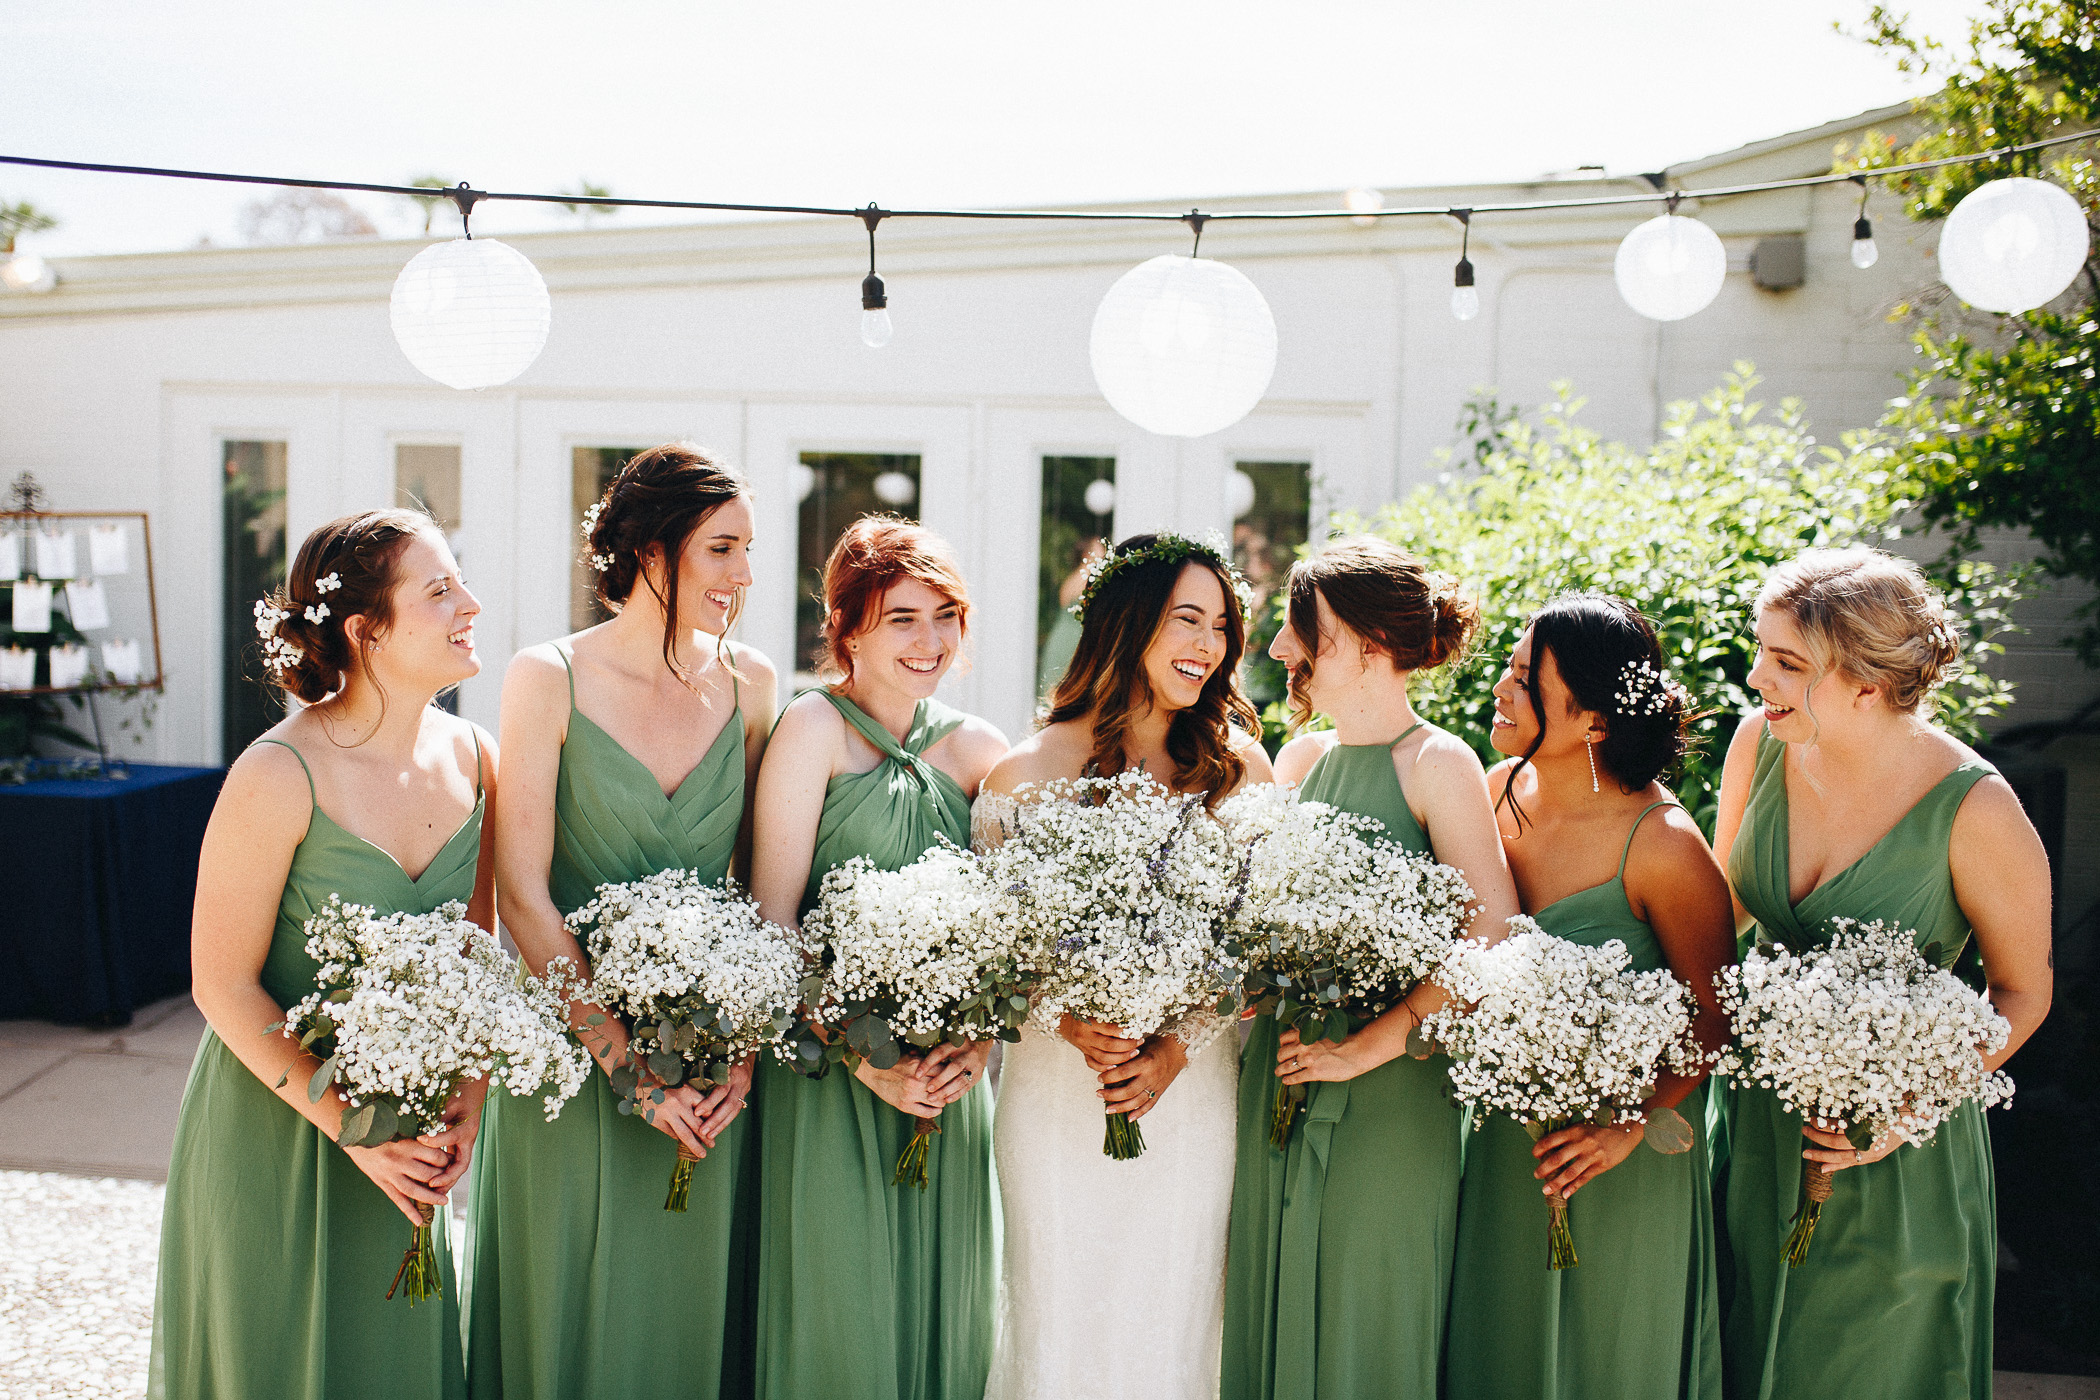 181104-Luxium-Weddings-Arizona-@matt__Le-Brandon-Kariana-Phoenix-Valley-Garden-Center-1010.jpg